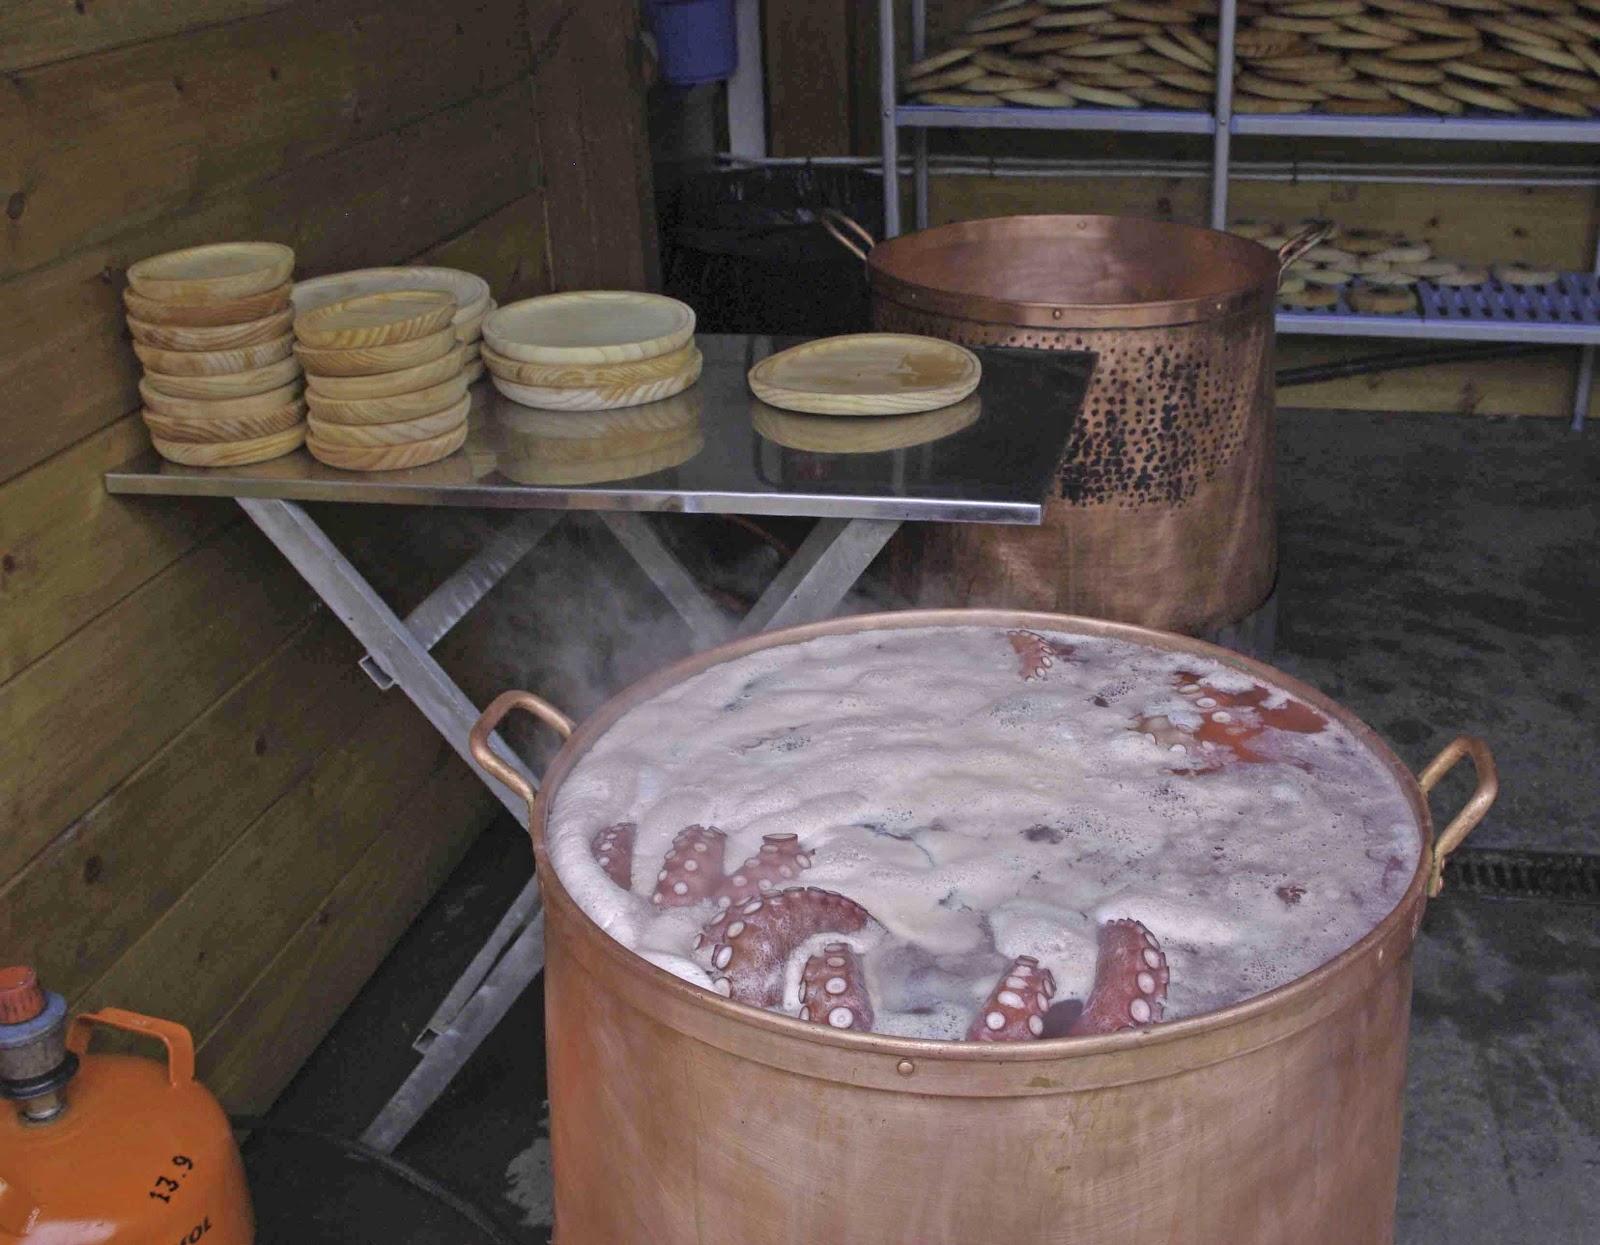 octopus_copper_saucepan_gluten_free